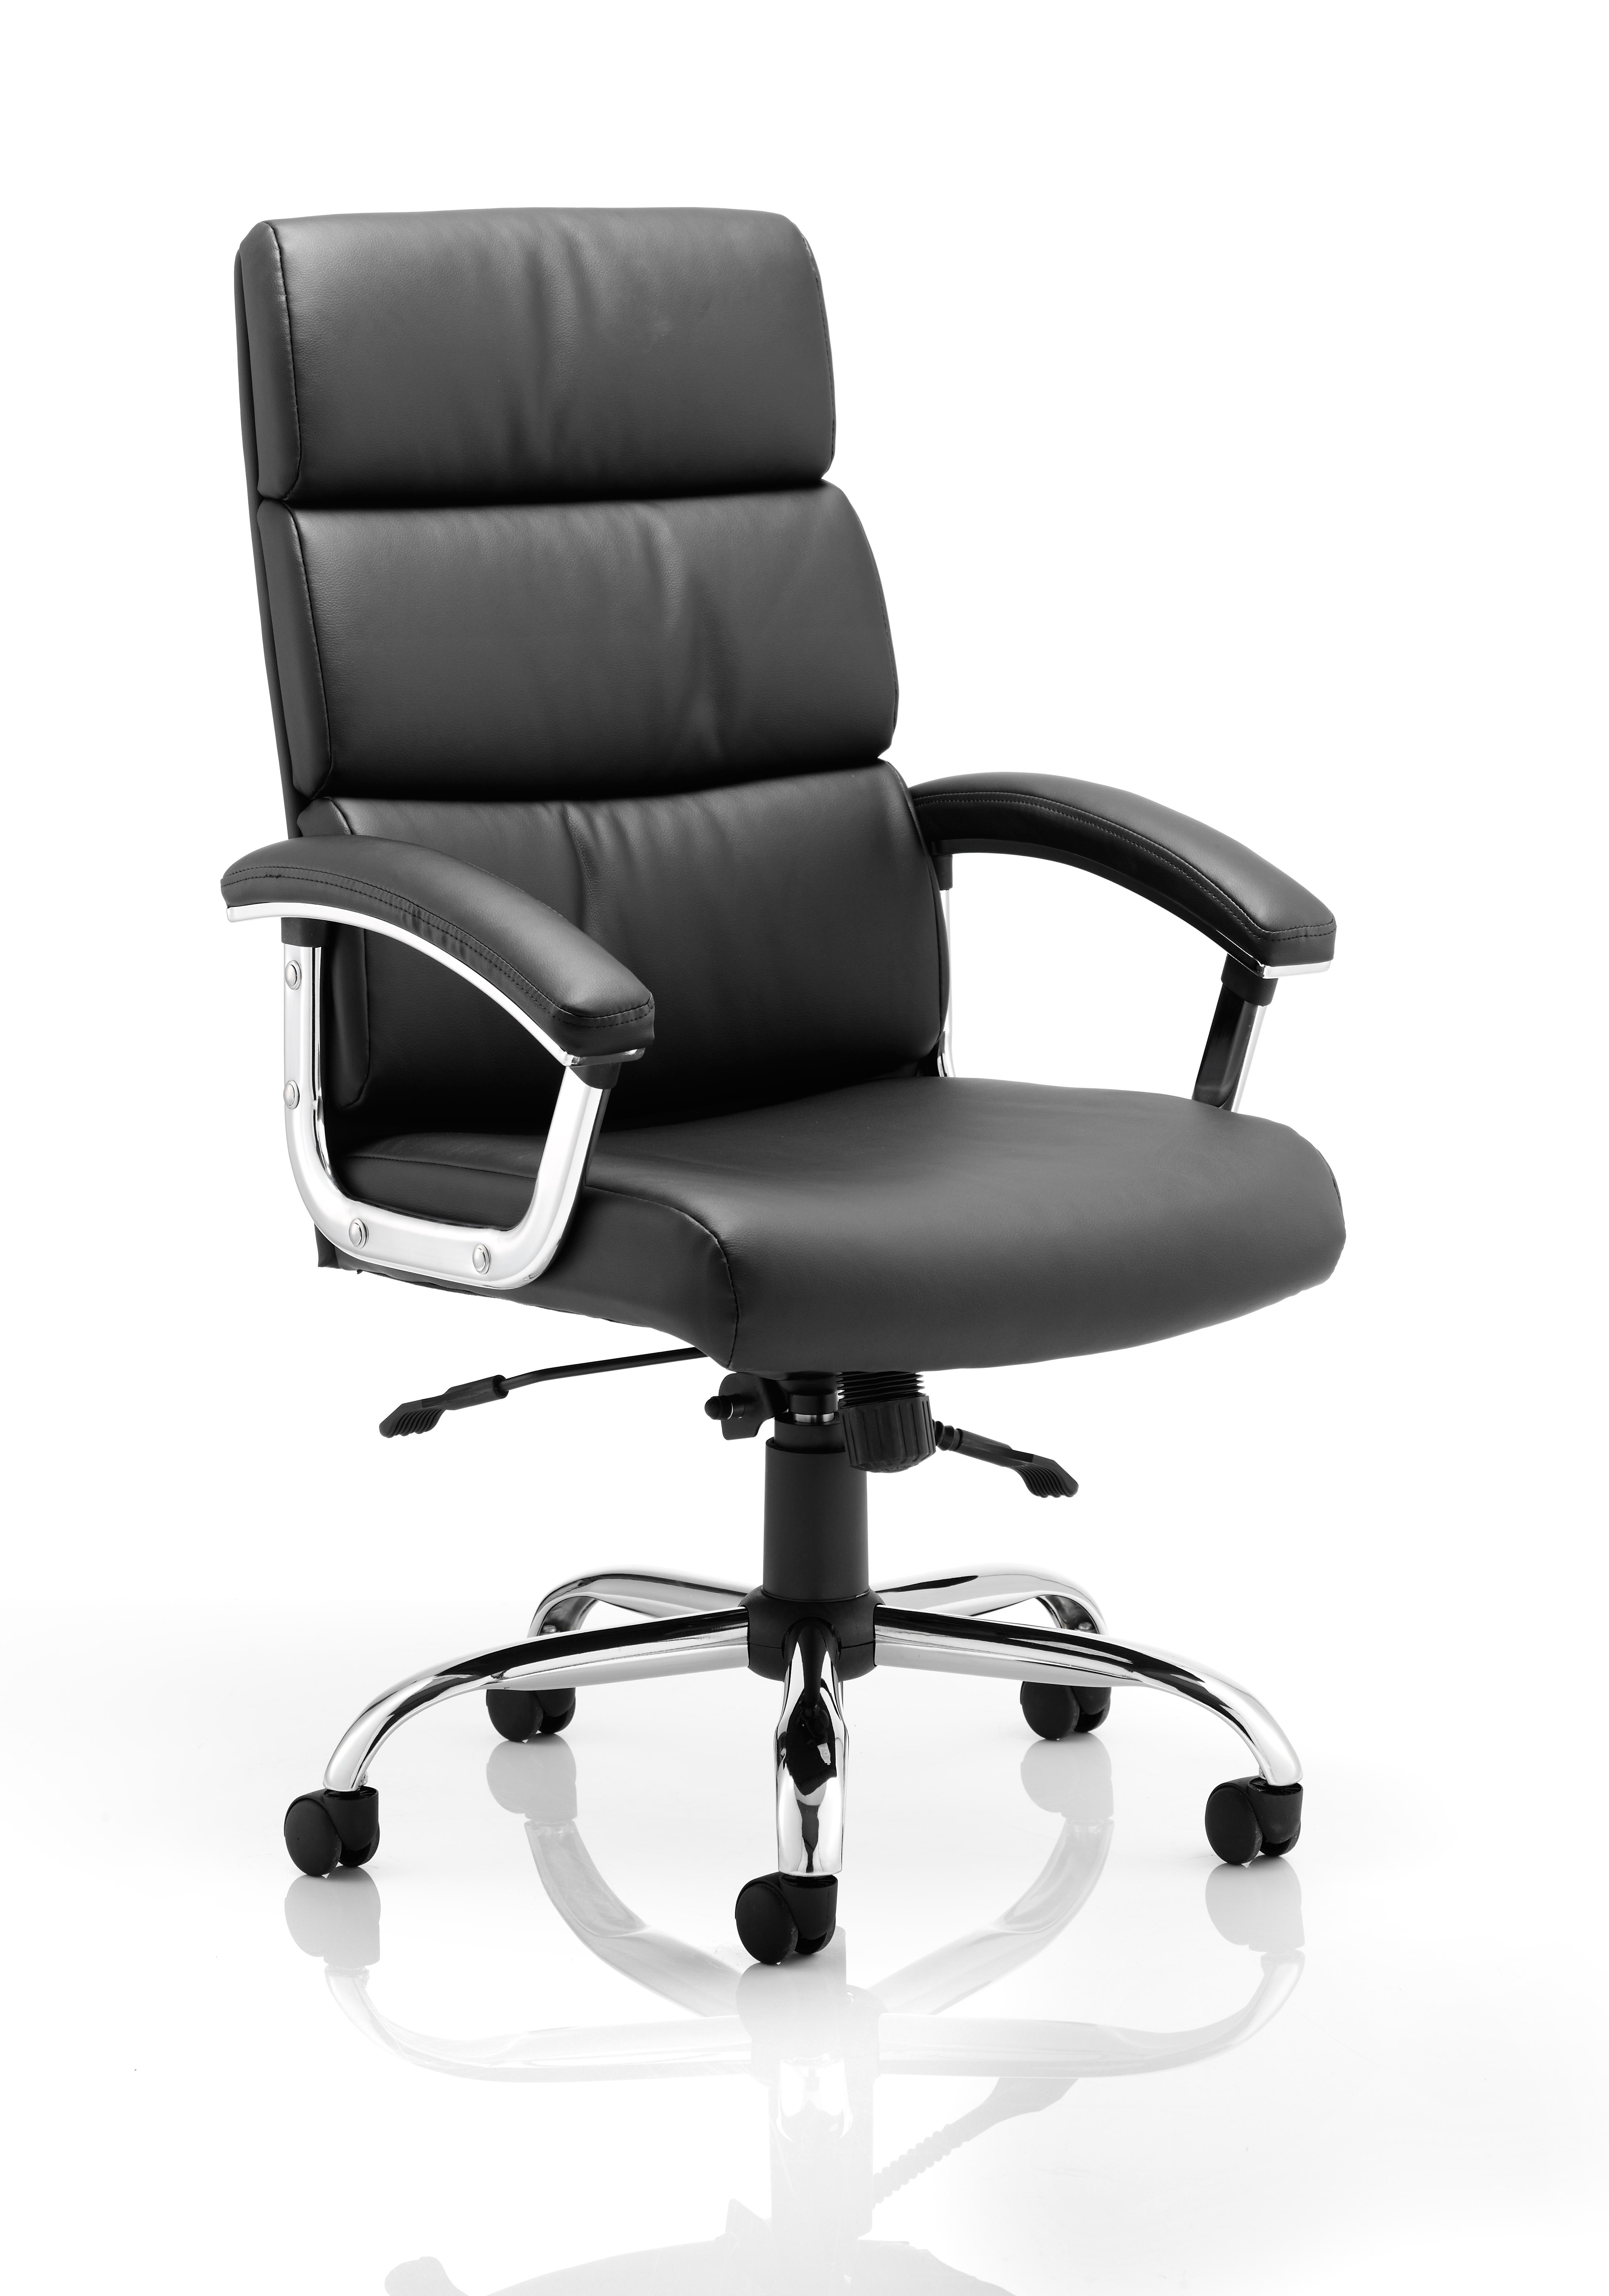 Executive Chairs Desire High Executive Chair Black EX000019